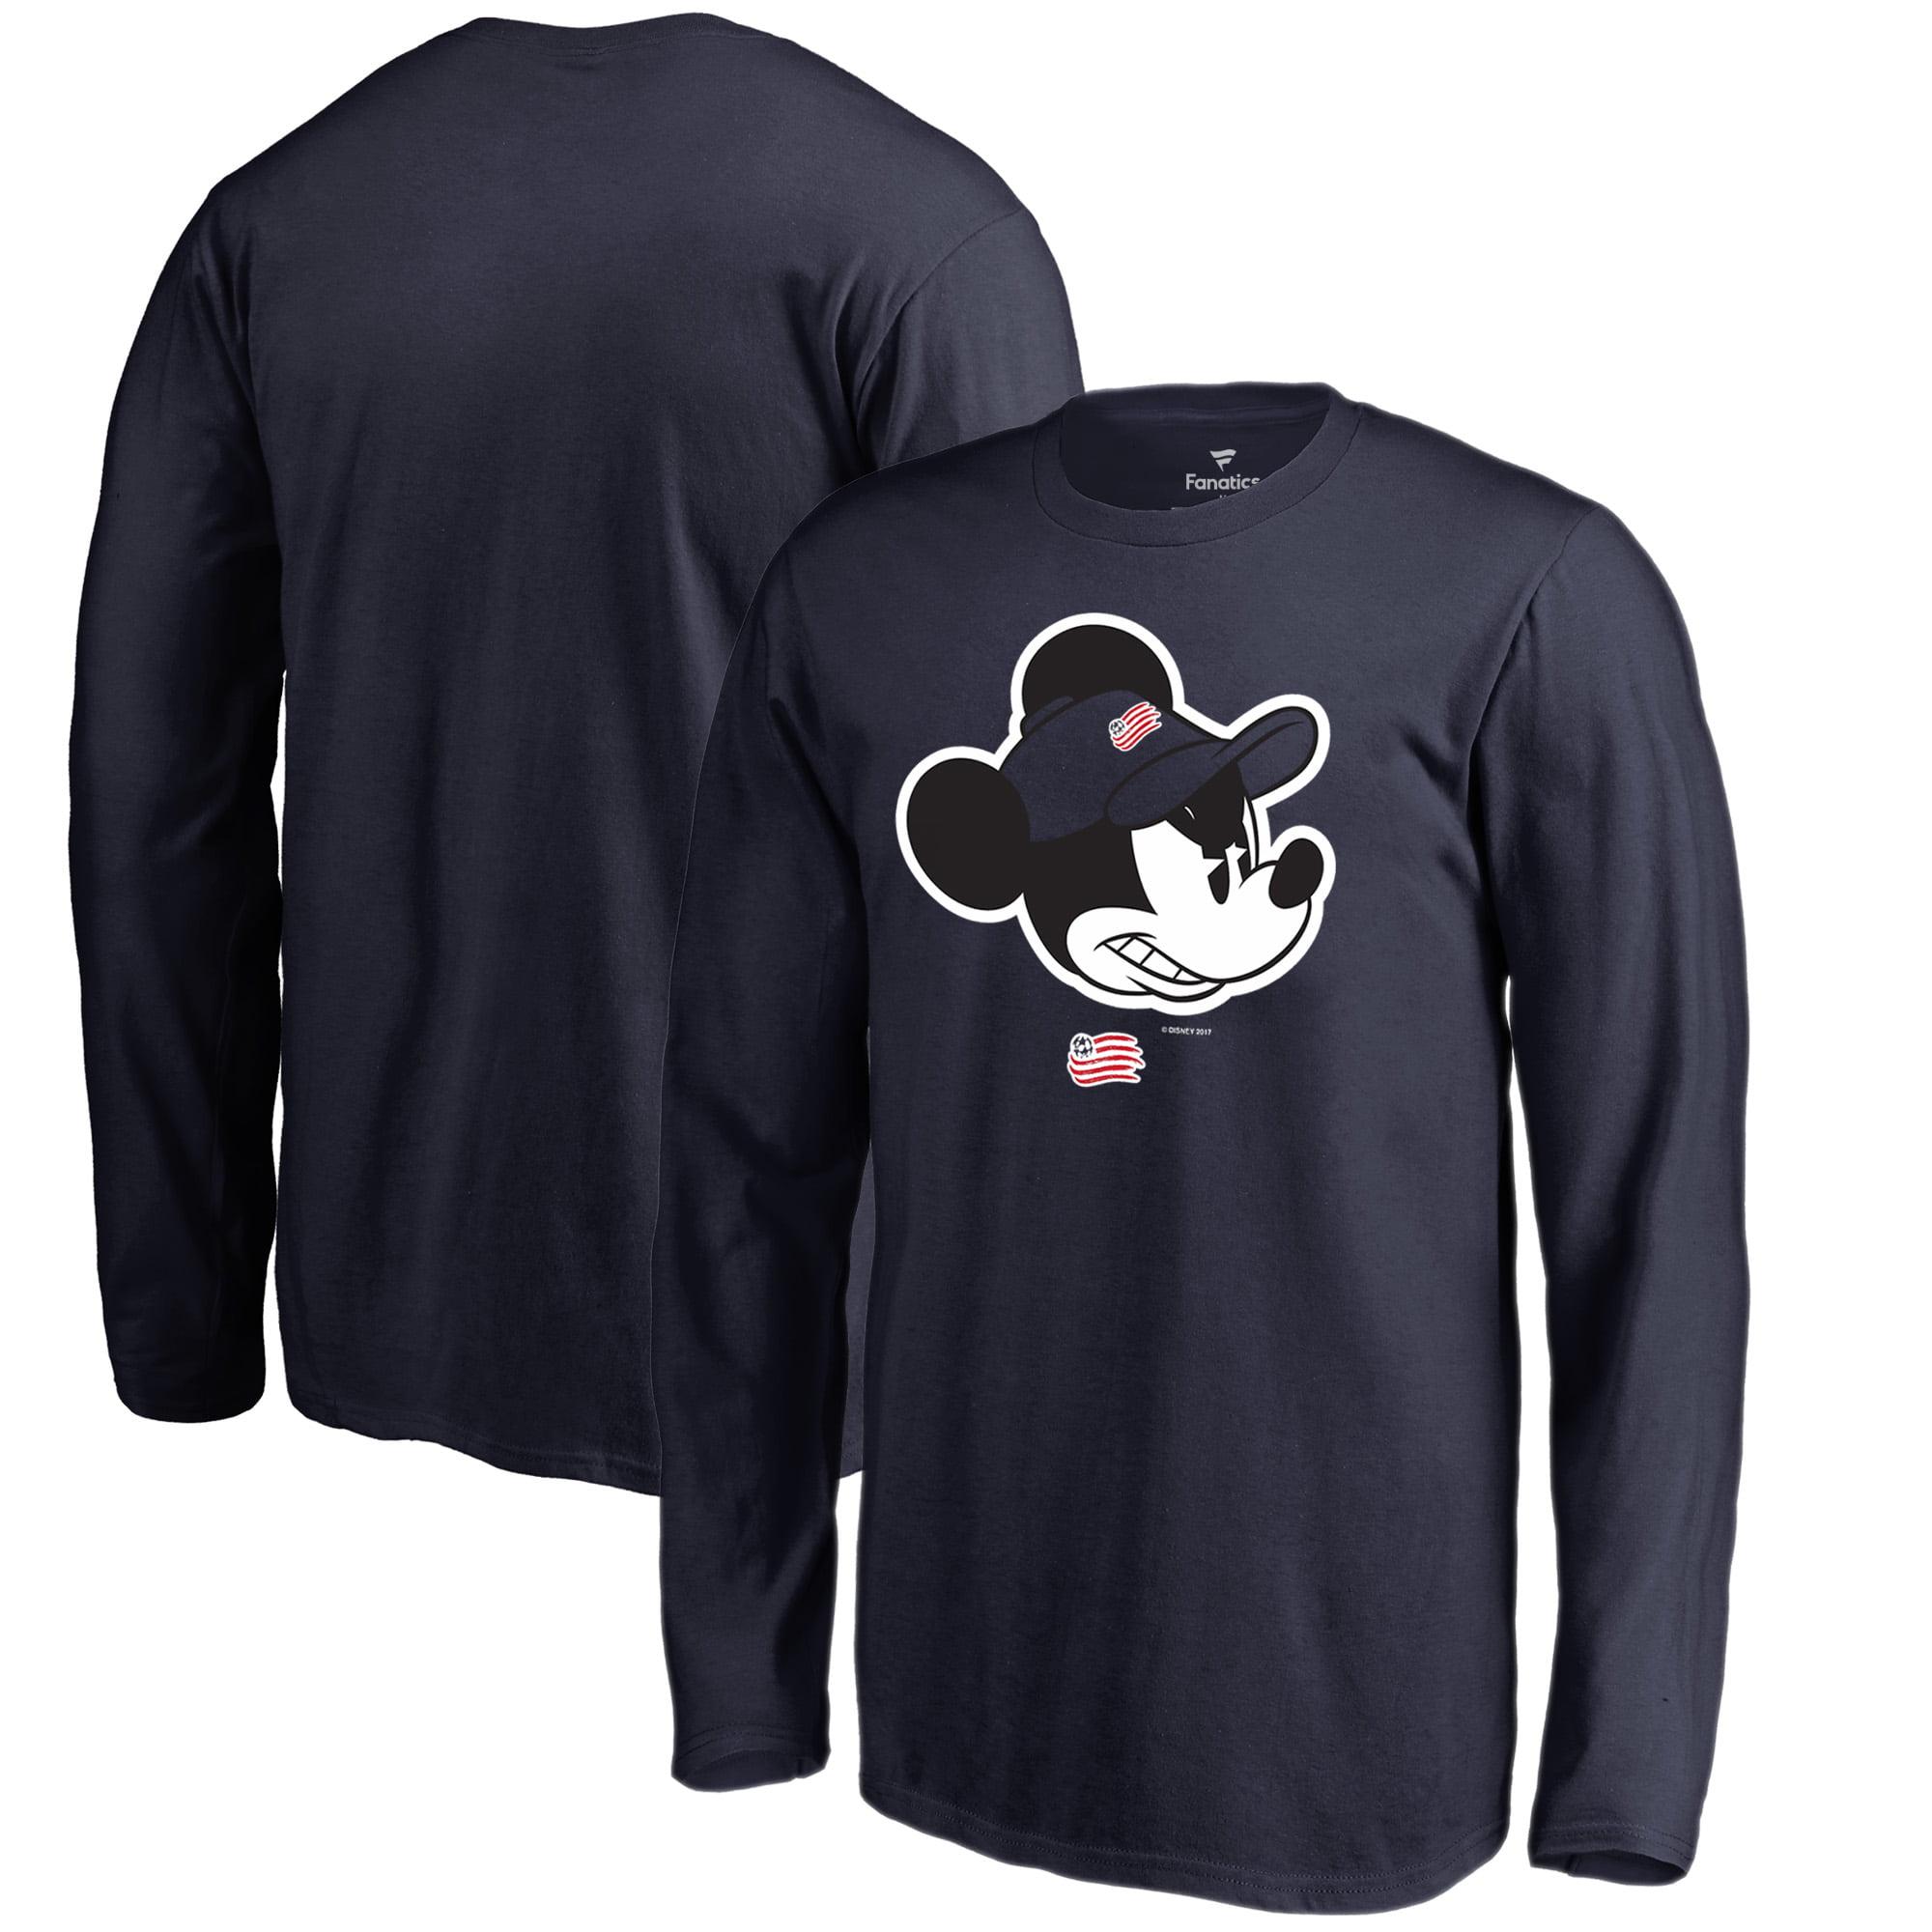 New England Revolution Fanatics Branded Youth Disney Game Face Long Sleeve T-Shirt - Navy